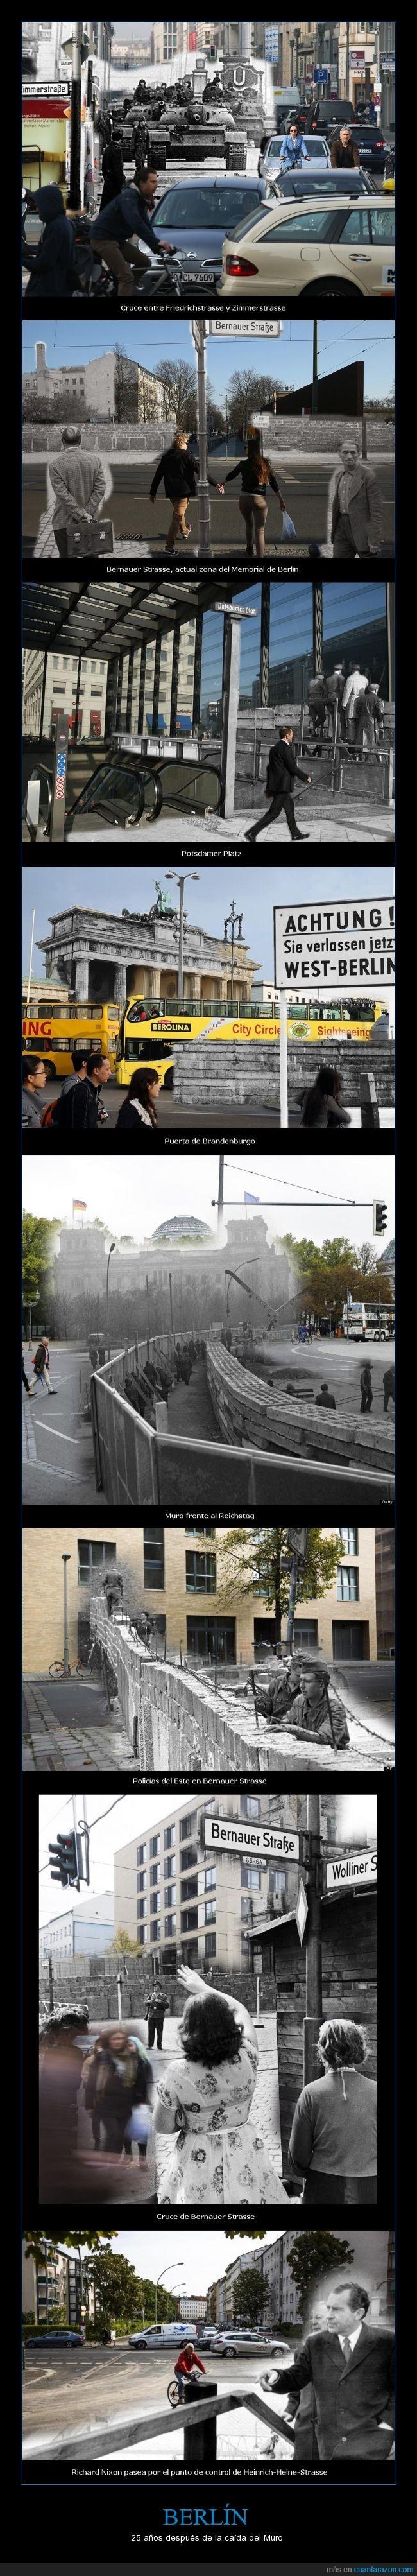 Actualidad,Berlín,Muro,Potsdamer Platz,Puerta de Brandenburgo,Richard Nixon